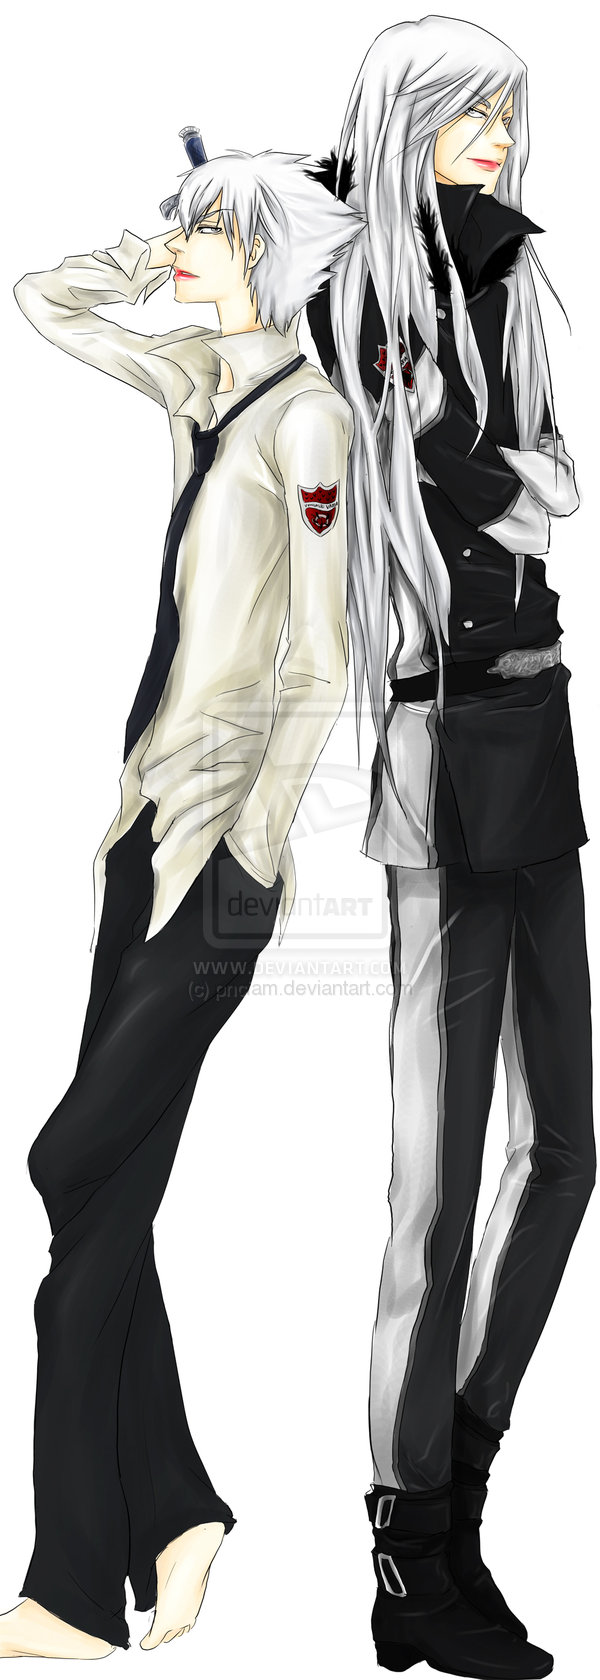 Tags: Anime, Katekyo Hitman REBORN!, Superbi Squalo, deviantART